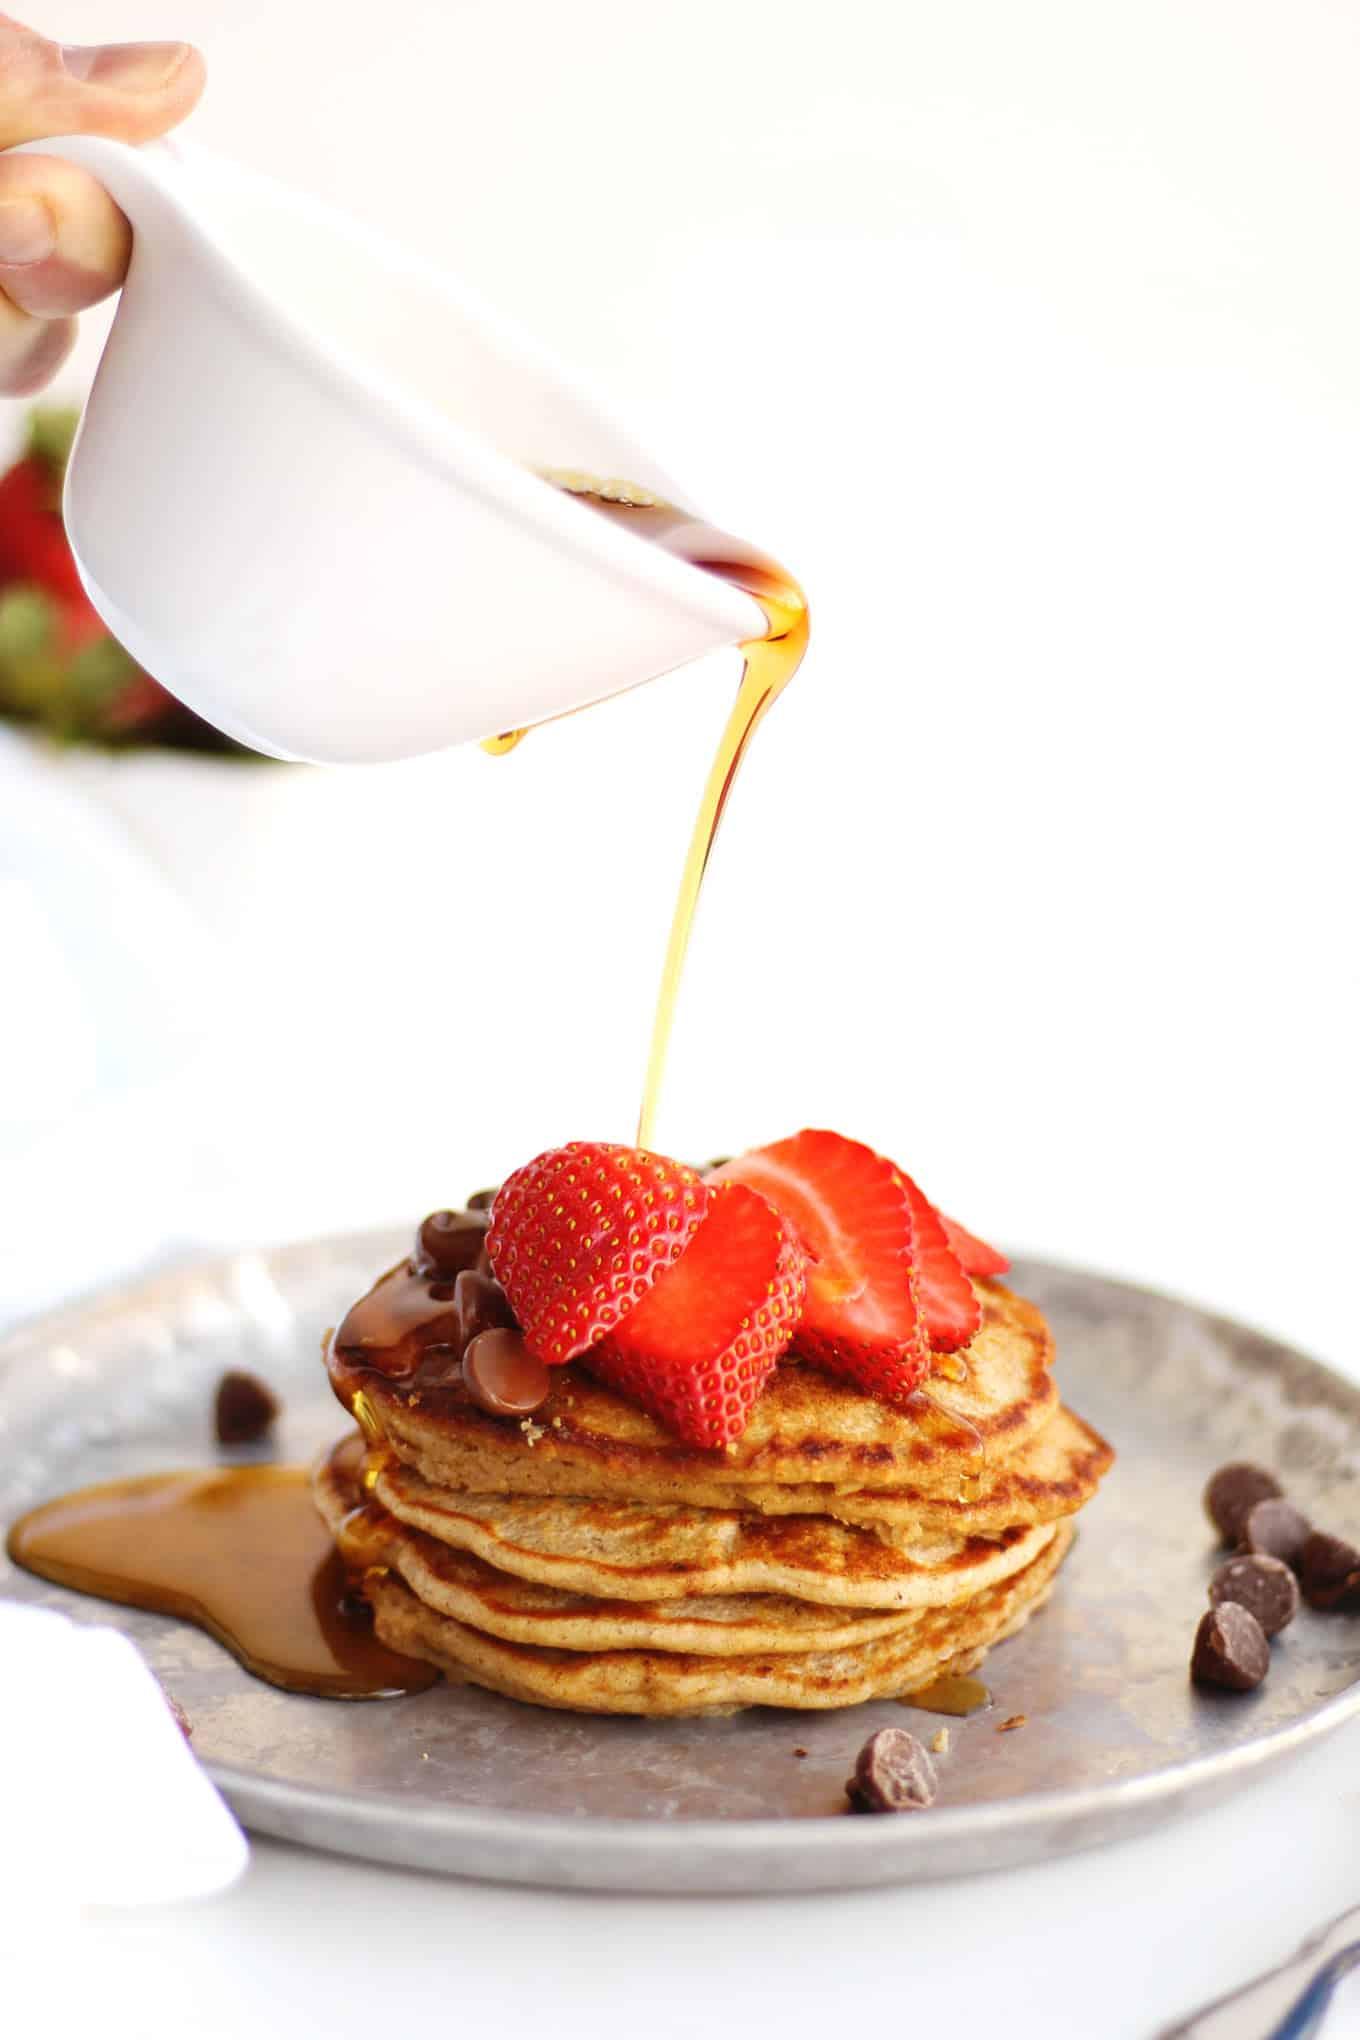 Healthy yogurt oat flour pancakes recipe